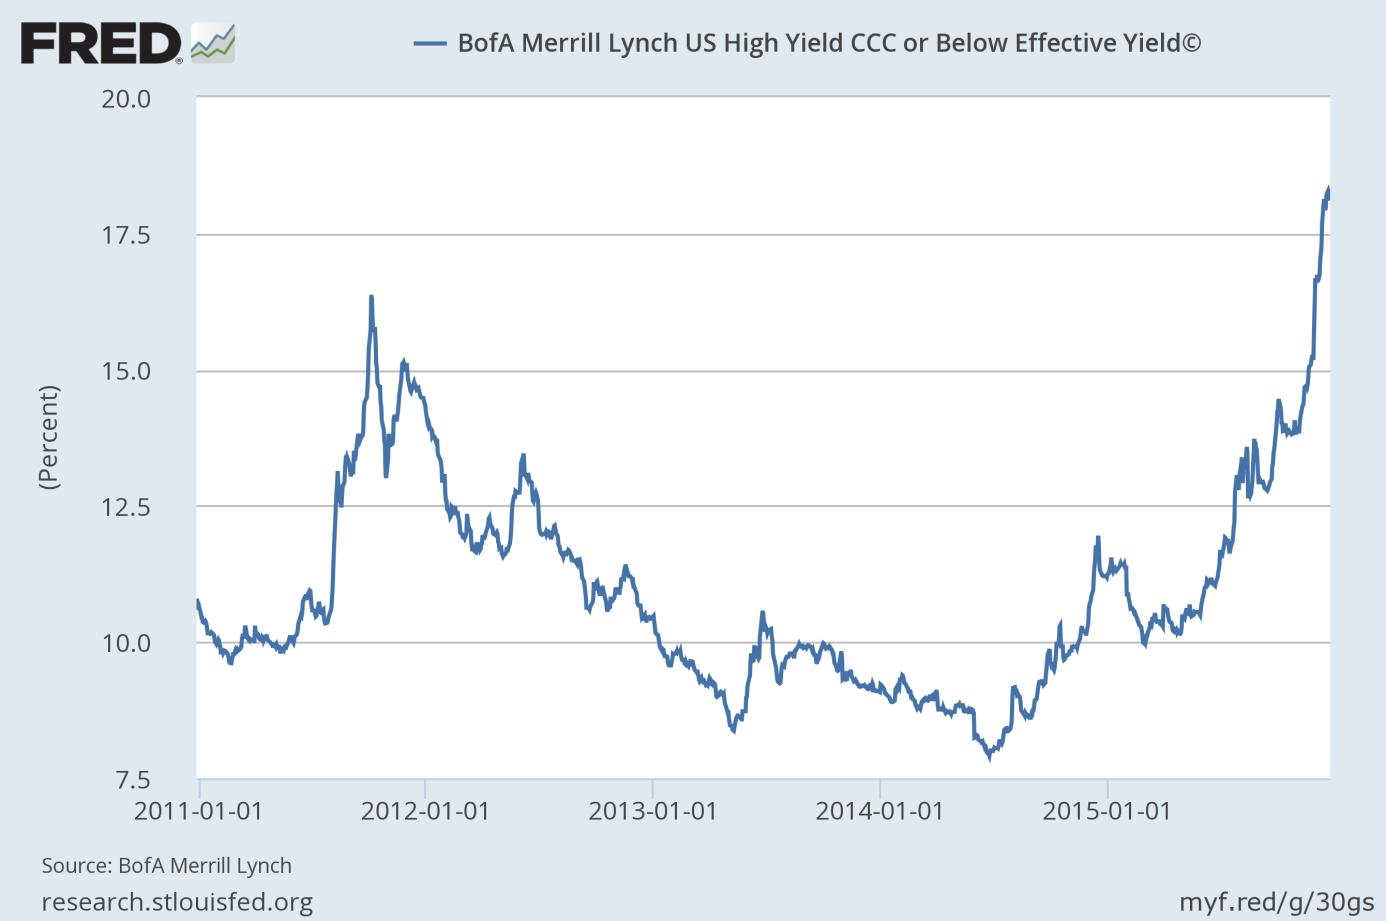 BofA Merrill Lynch US High Yield CCC